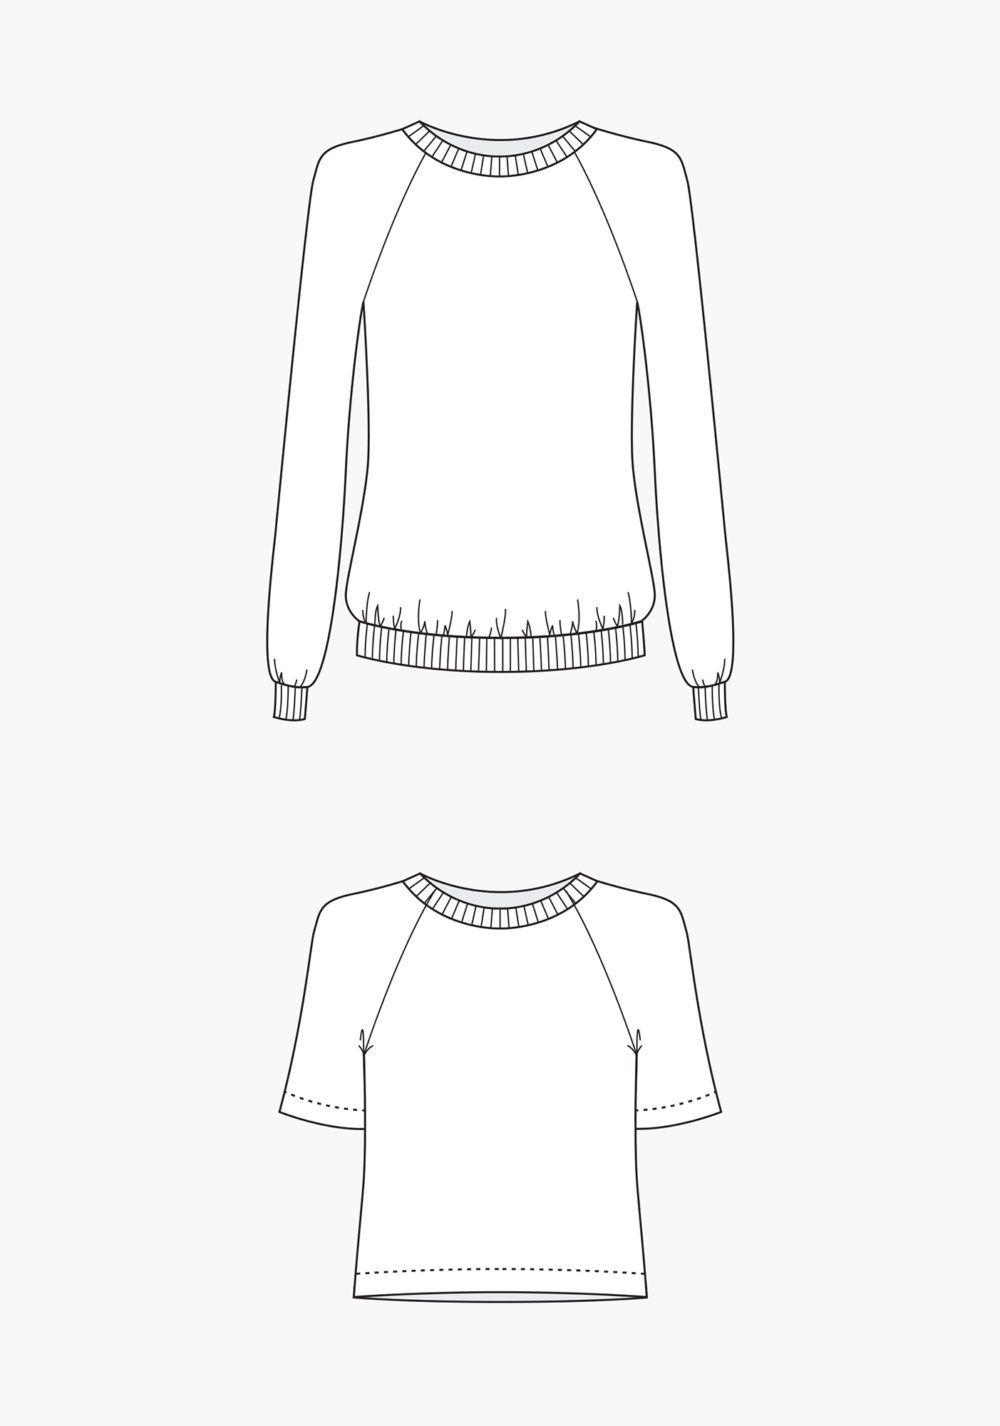 Linden Sweatshirt | Sewing Patterns | Pinterest | Schnittmuster ...